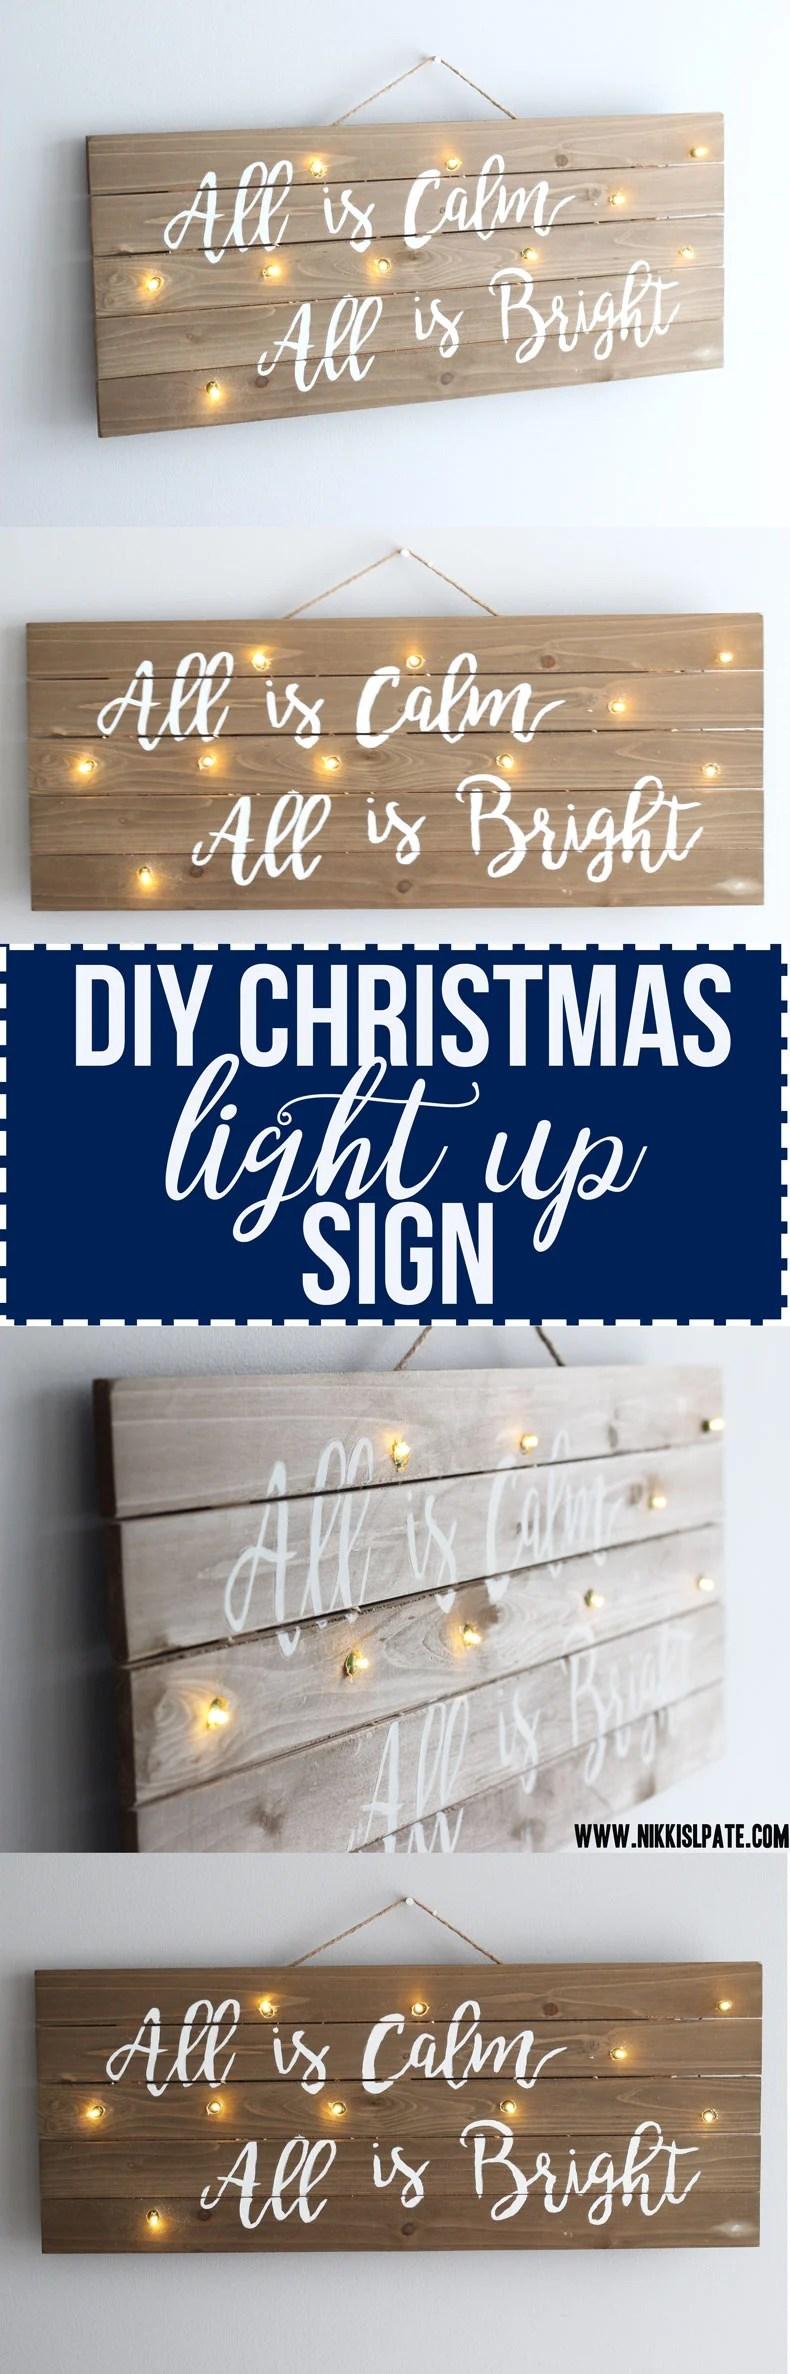 DIY Christmas Light Up Sign || Easy fun craft decor for the holidays! - Nikki's Plate